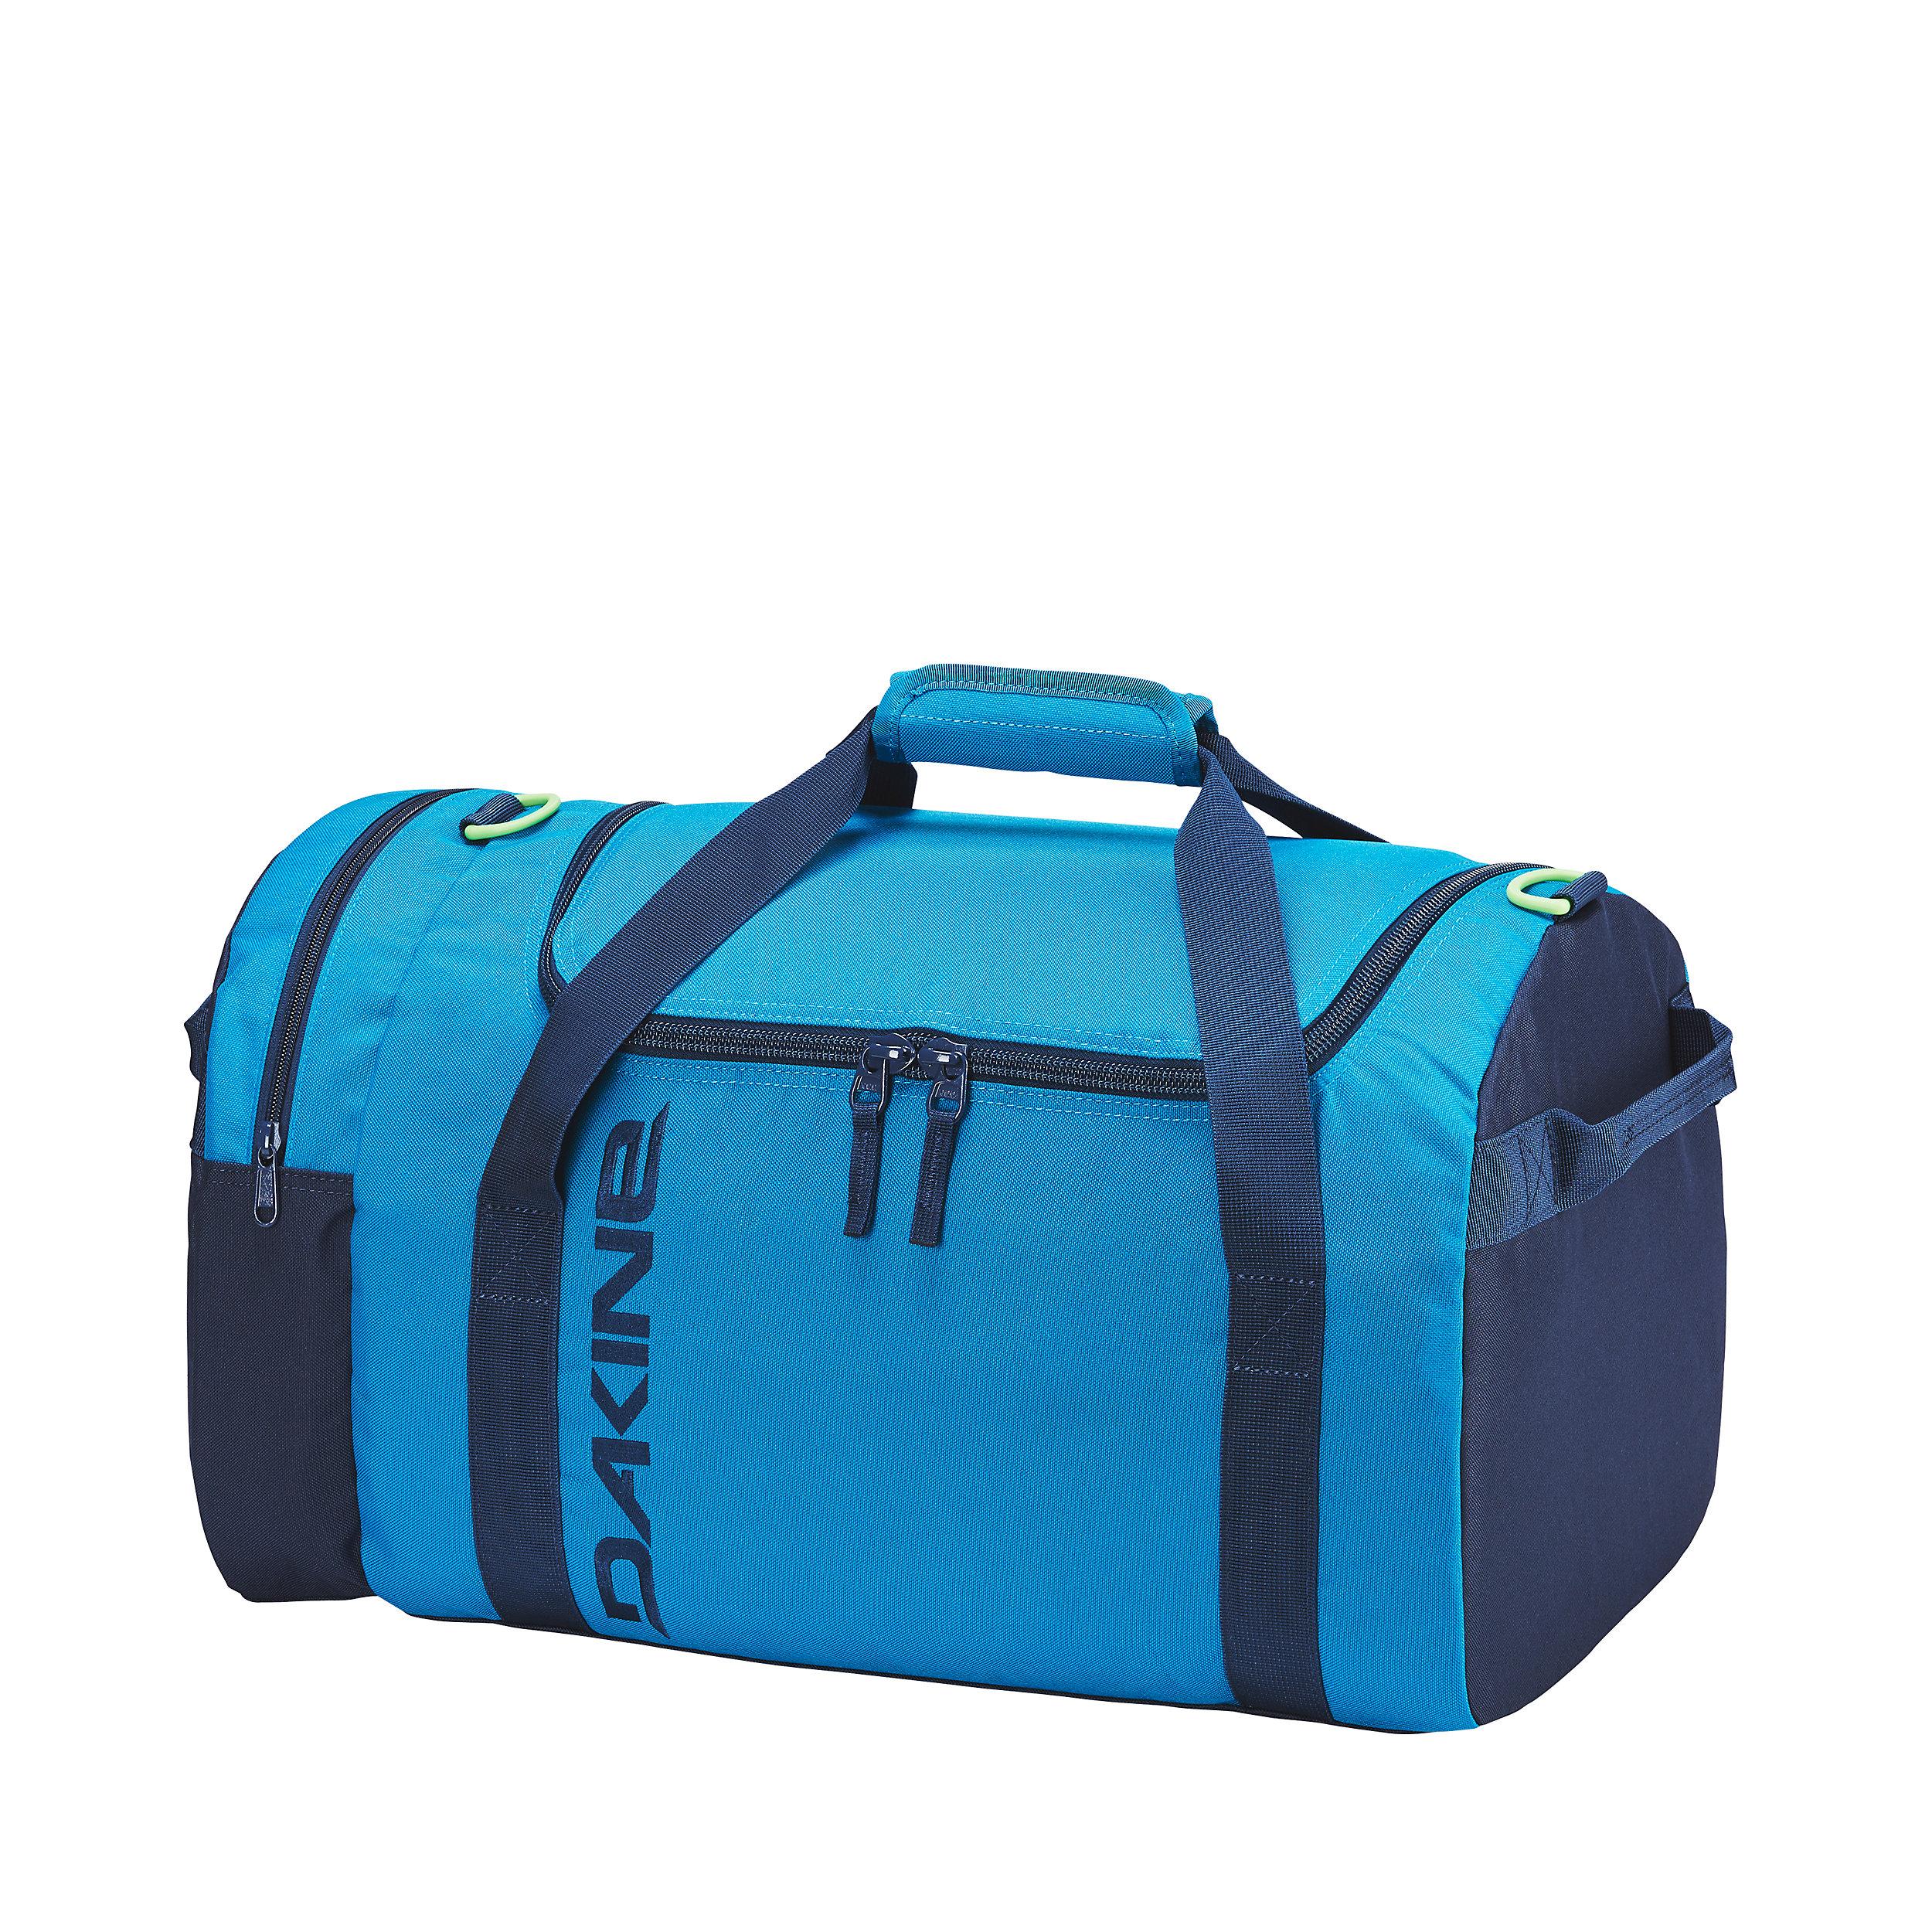 Reisetasche EQ Bag 31L Travel Bags